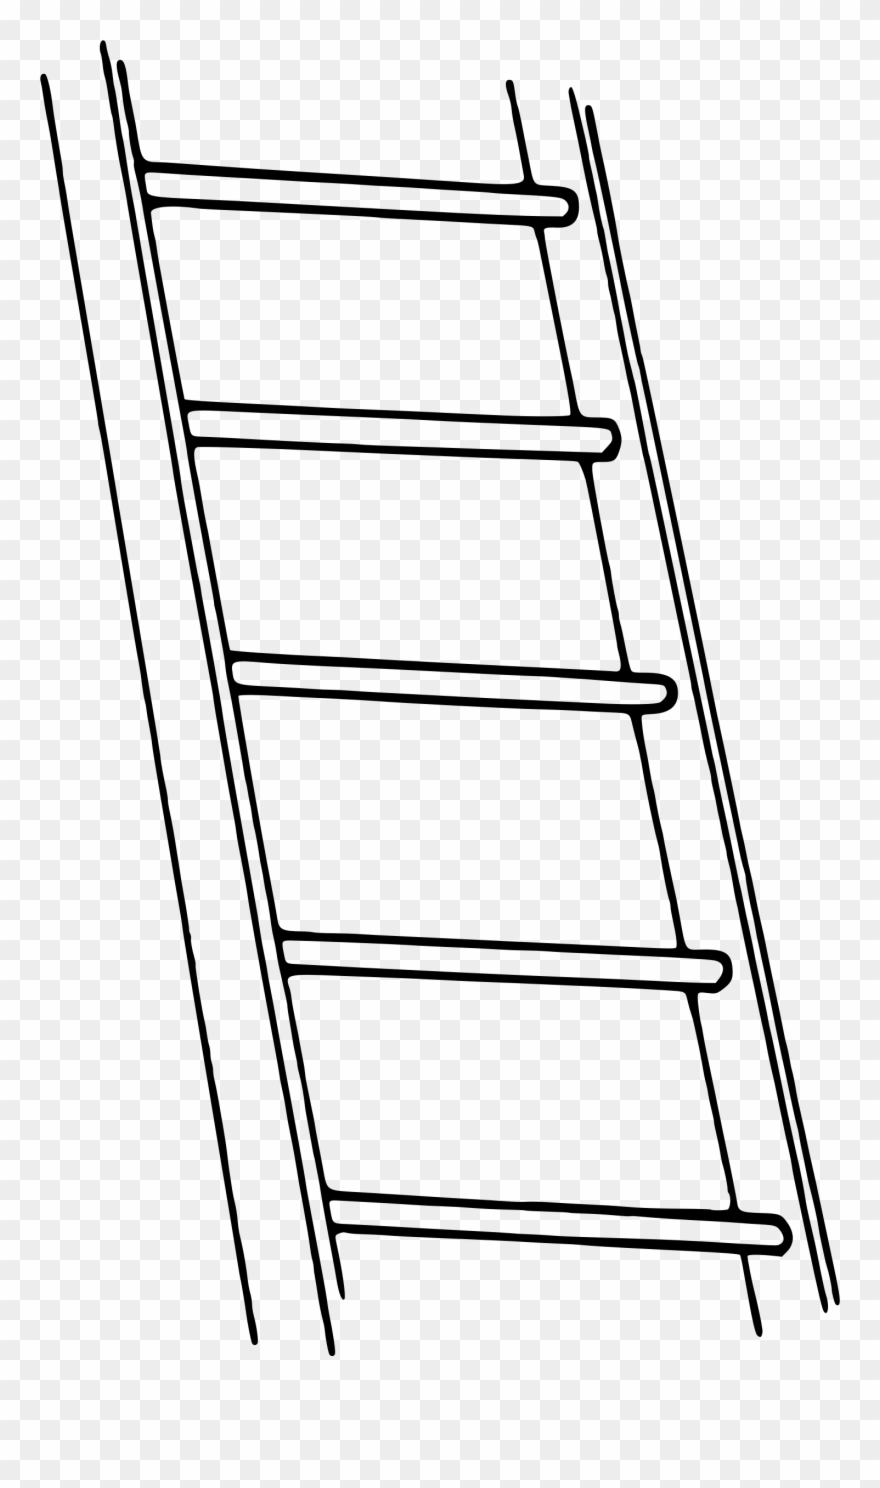 Ladder Clipart Black And White.